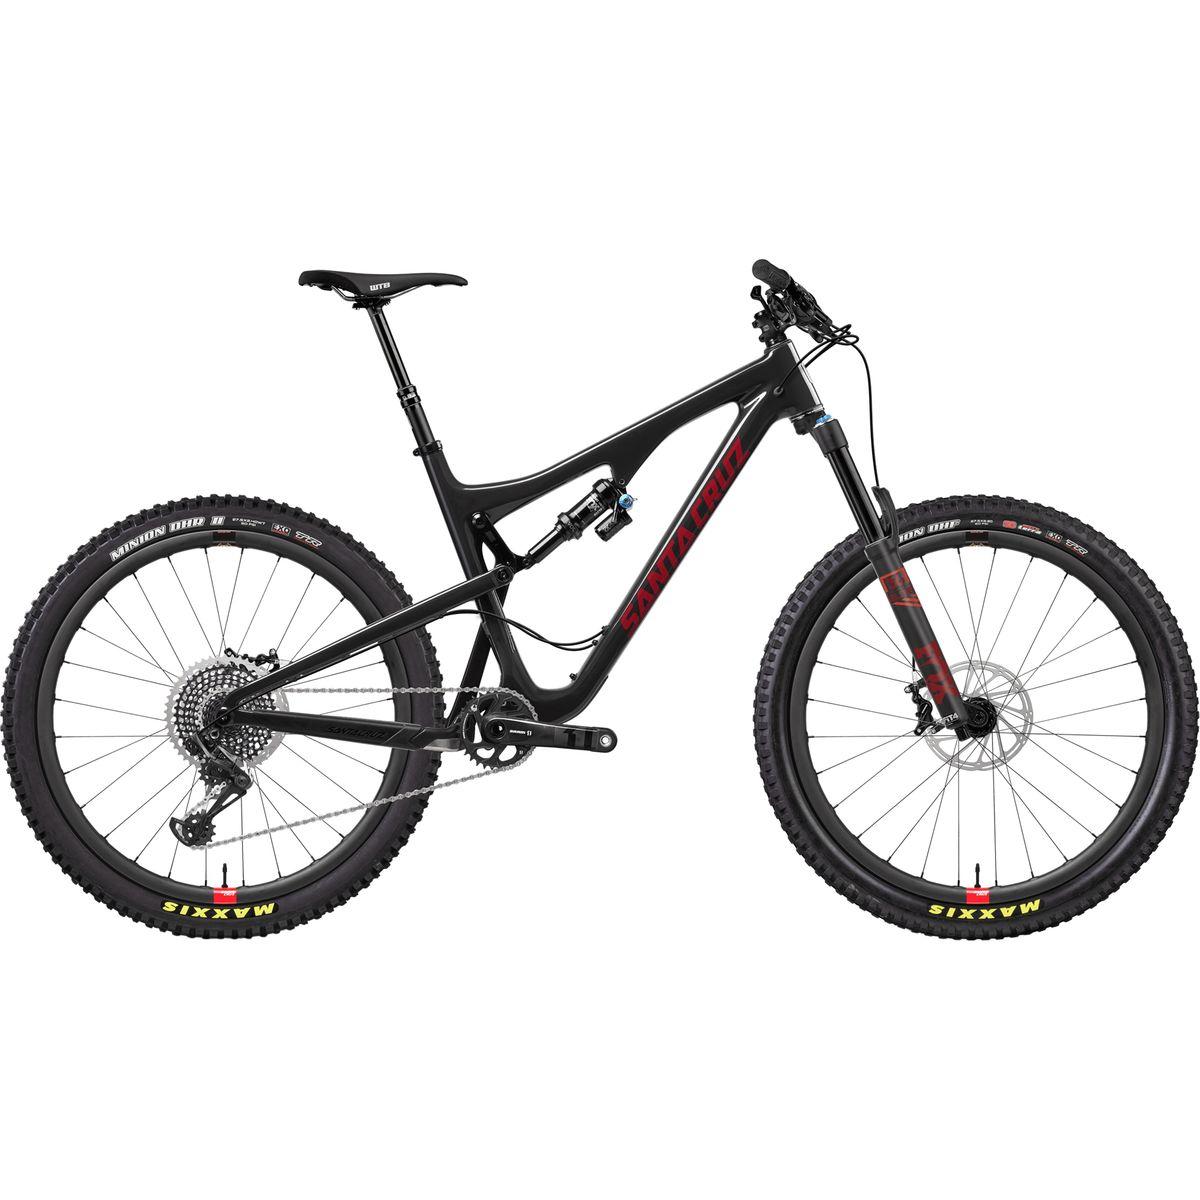 Santa Cruz Bicycles Bronson 2.1 Carbon CC X01 Eagle Reserve Complete 2018 Carbon Sriracha